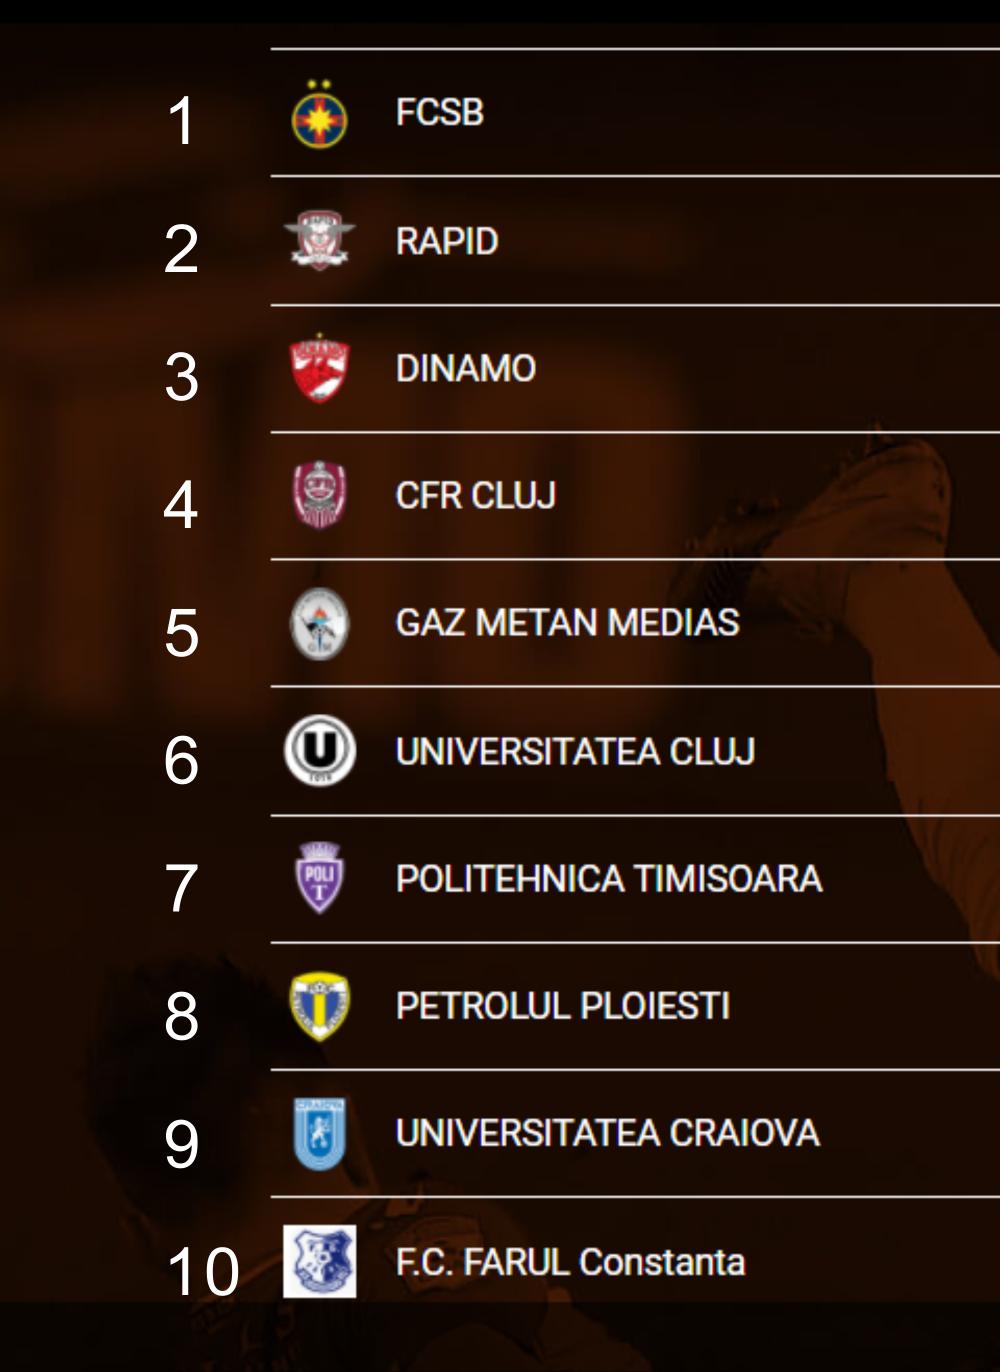 FCSB e prima in topul suporterilor din Liga 1, Rapid e pe 2, Dinamo a 3-a. Steaua n-a prins top 10! Cum arata top 10